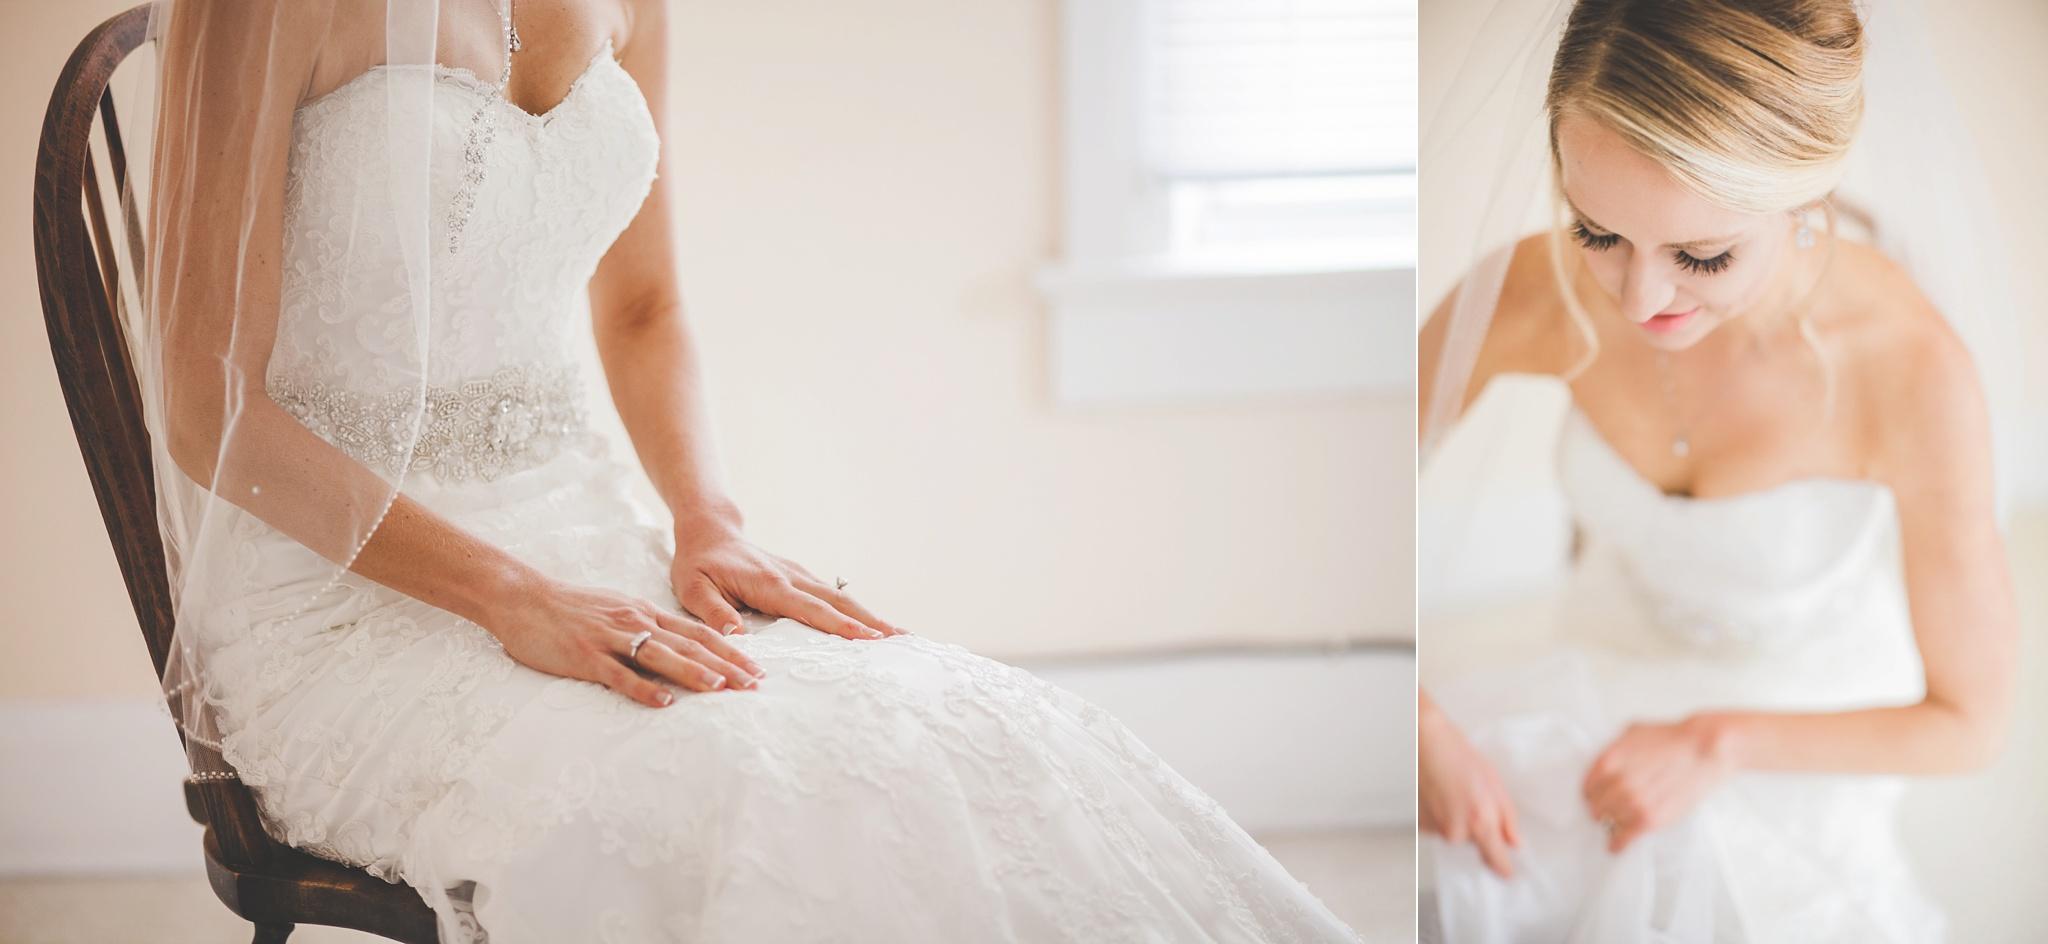 St. Louis Wedding Photographer   Chandler Rose Photography_0016.jpg